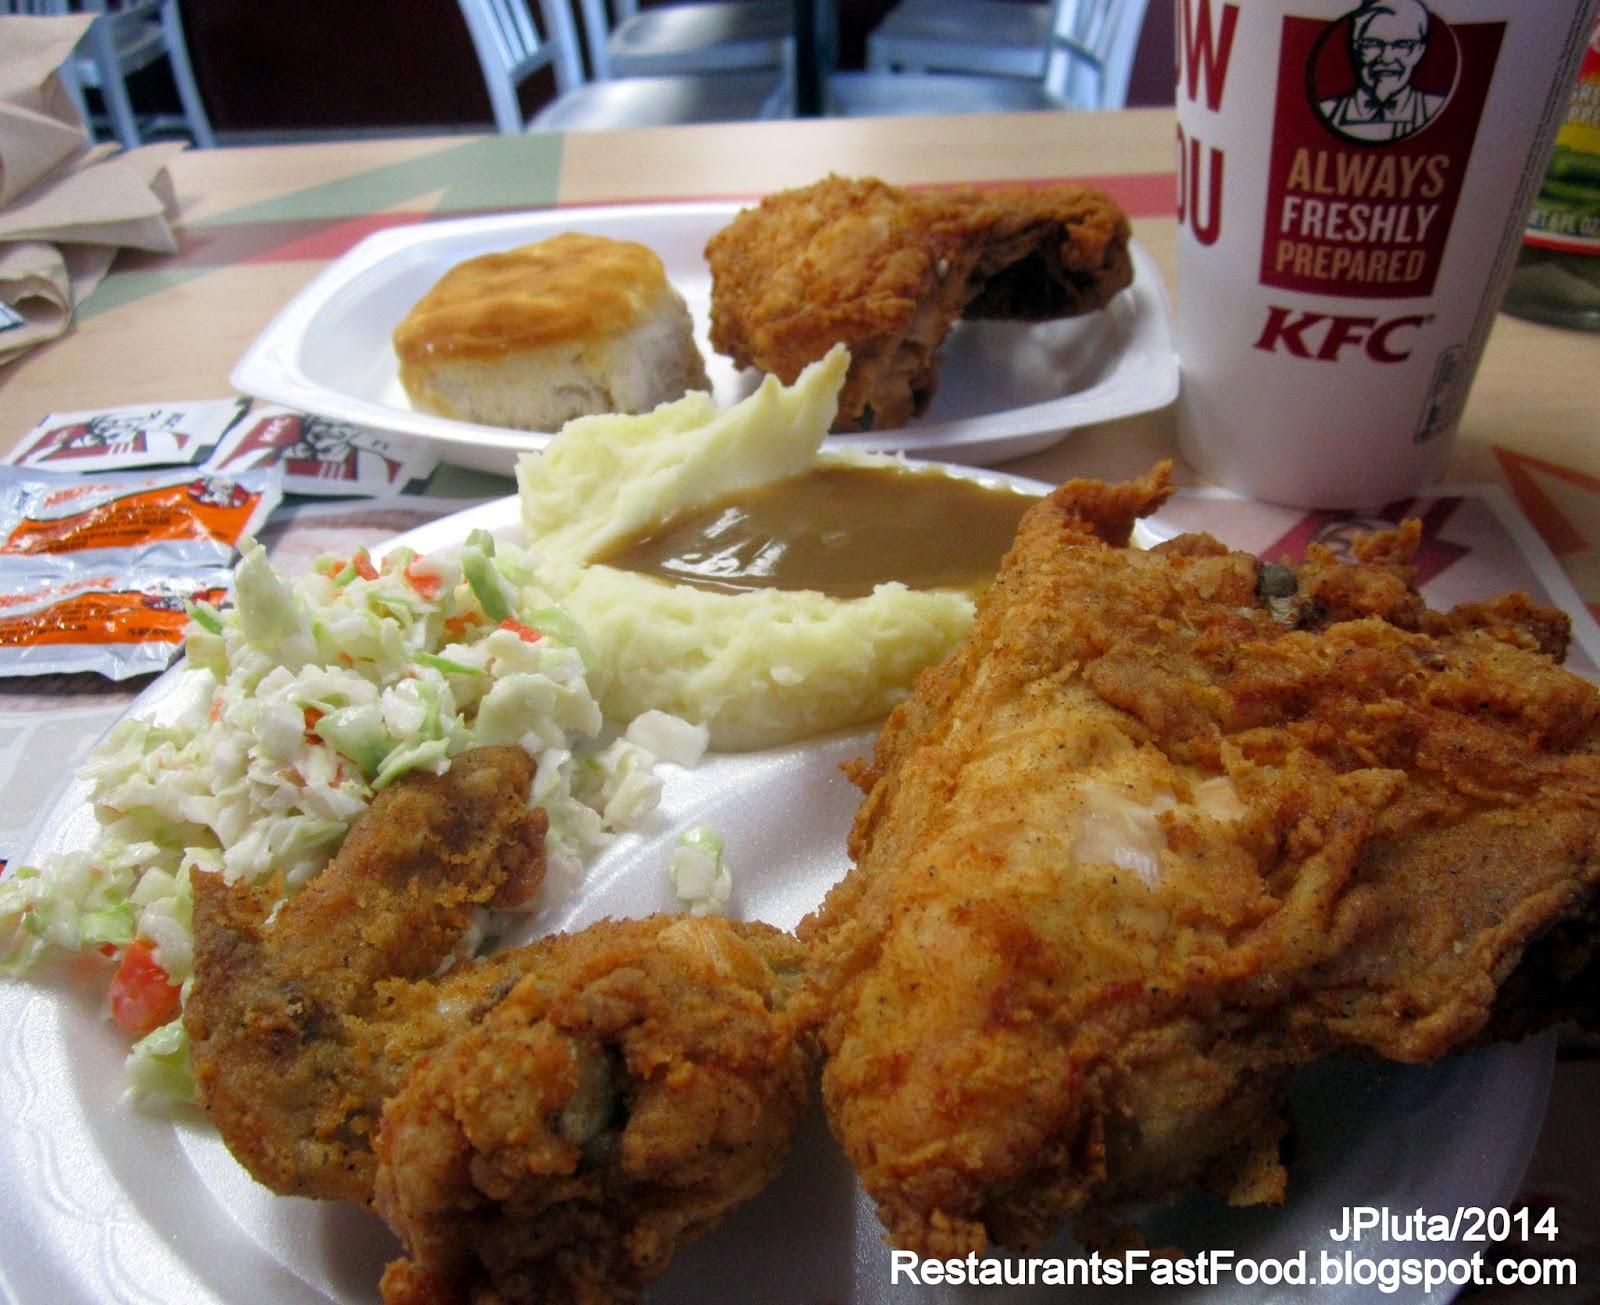 Kentucky Fried Chicken Meal: HOLLYWOOD FLORIDA Broward Dr.Hospital Casino Restaurant